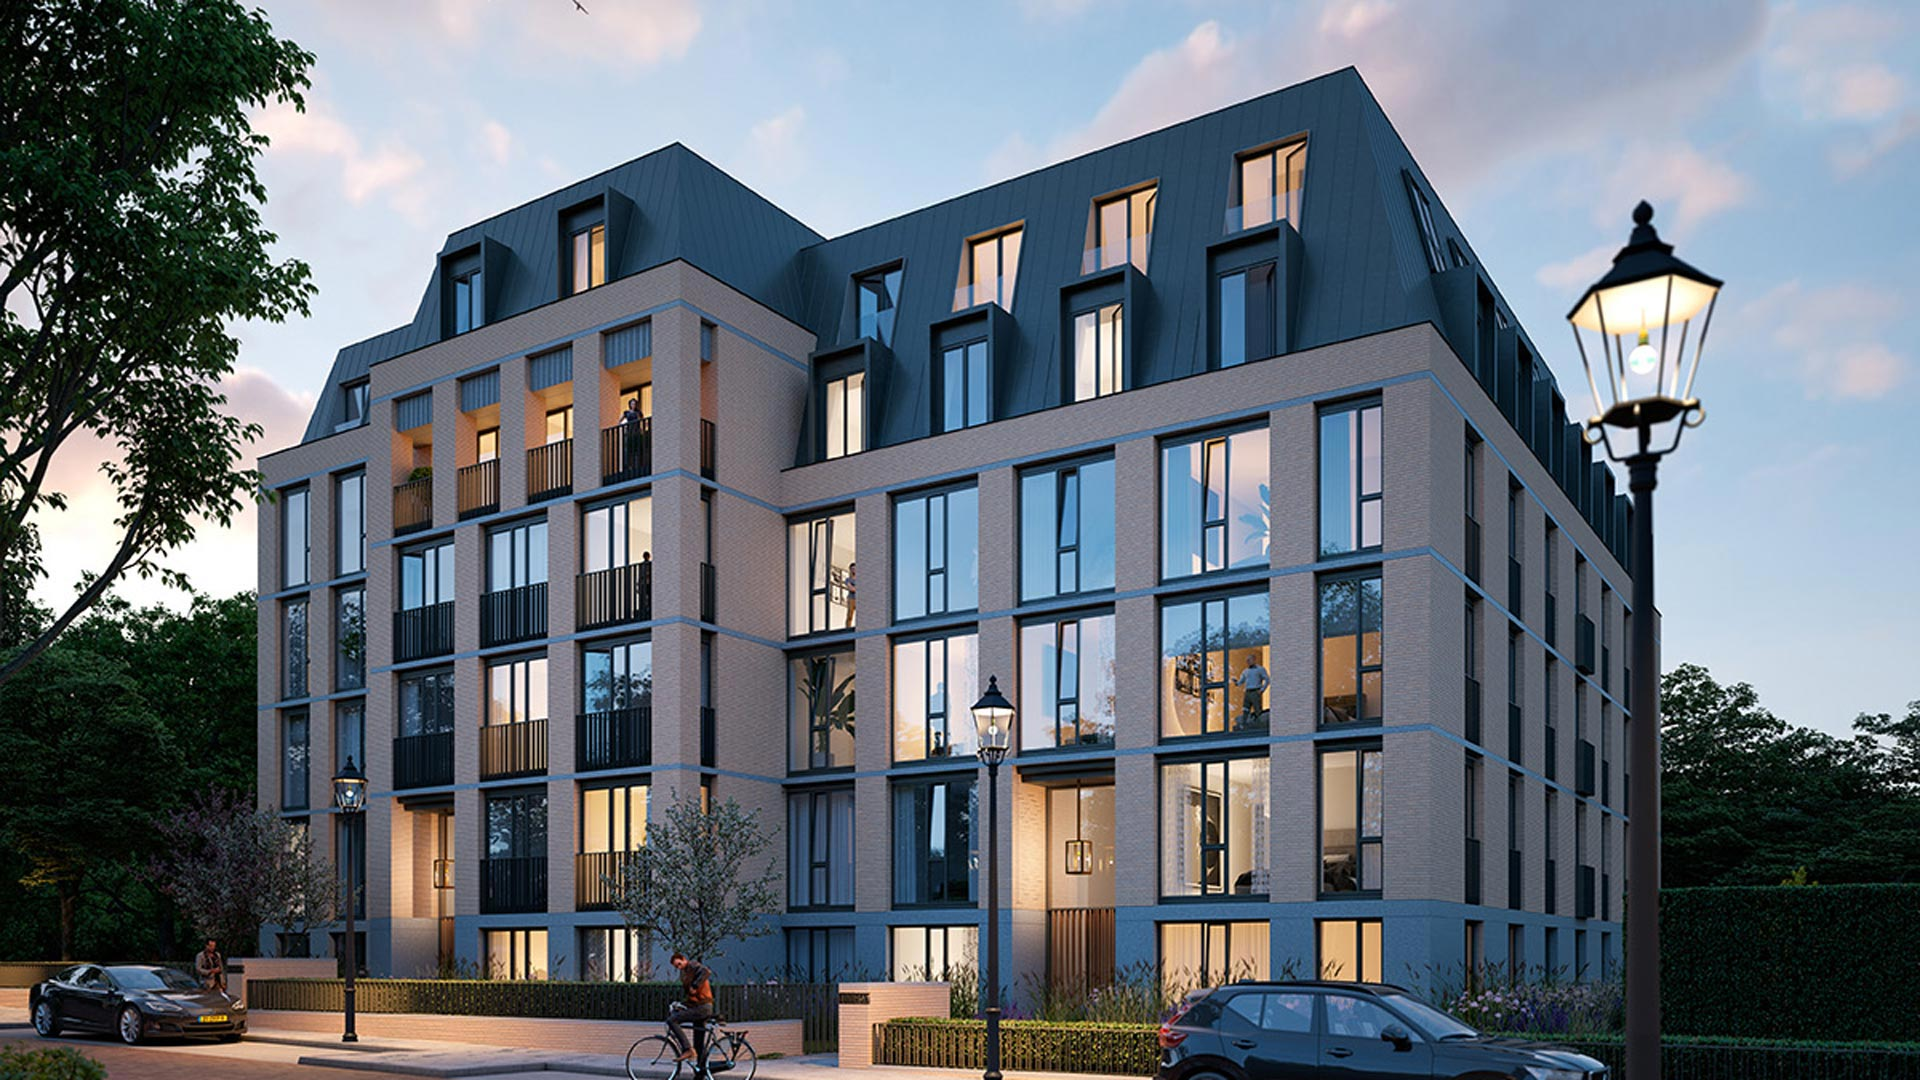 Nieuwbouw Den Haag - Villa Appartementen - Elion Park